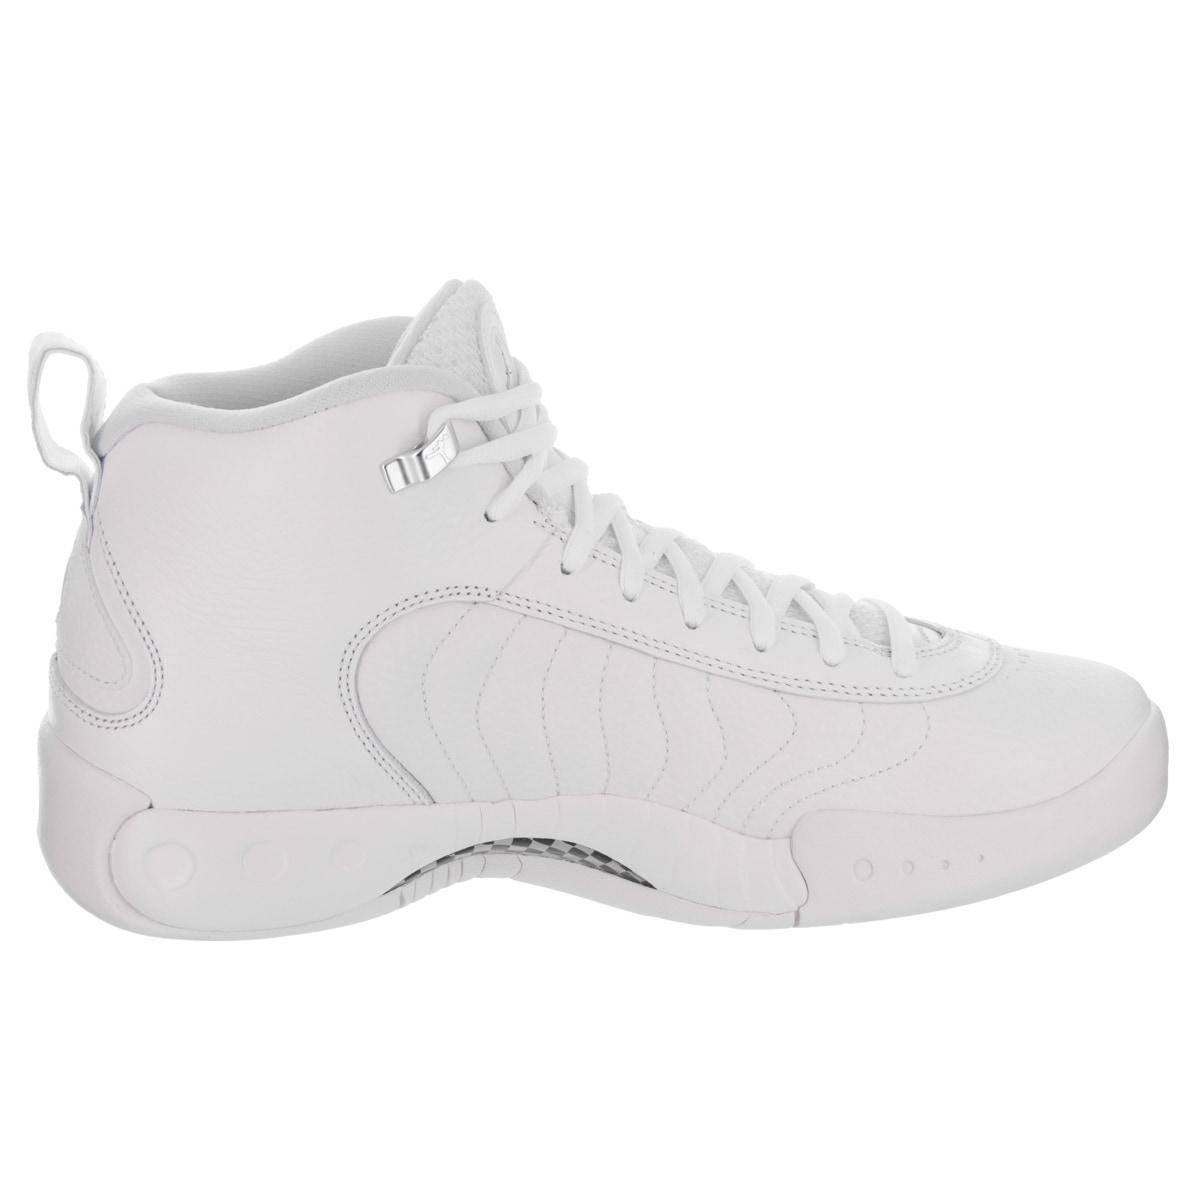 4d822741e097a8 Shop Nike Jordan Men s Jordan Jumpman Pro Basketball Shoe - Free ...